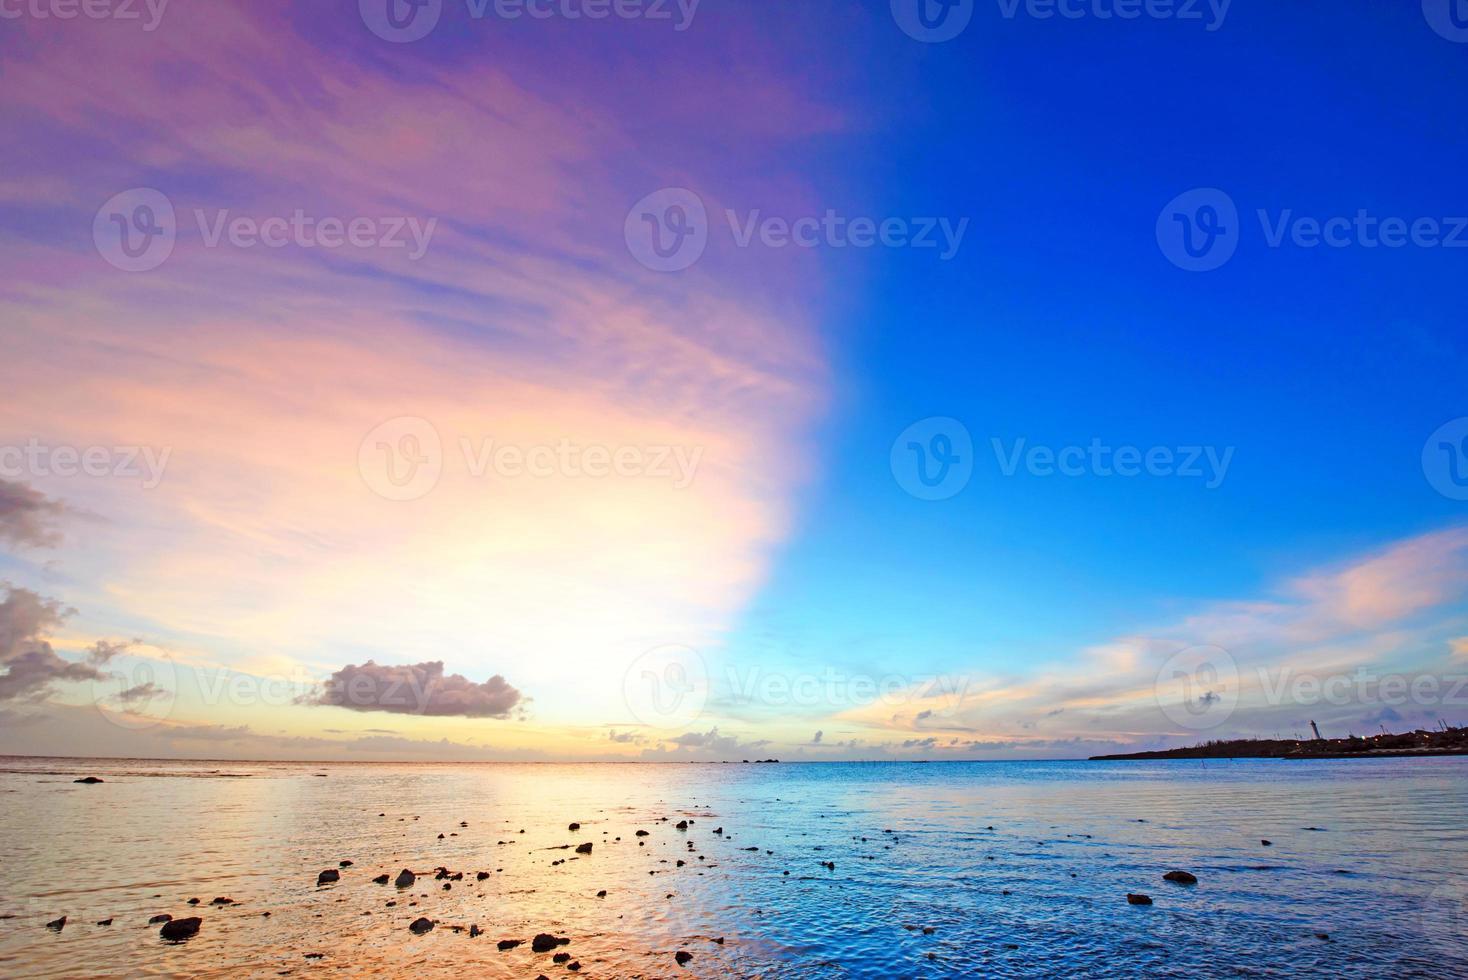 tramonto fantastico, okinawa, giappone foto